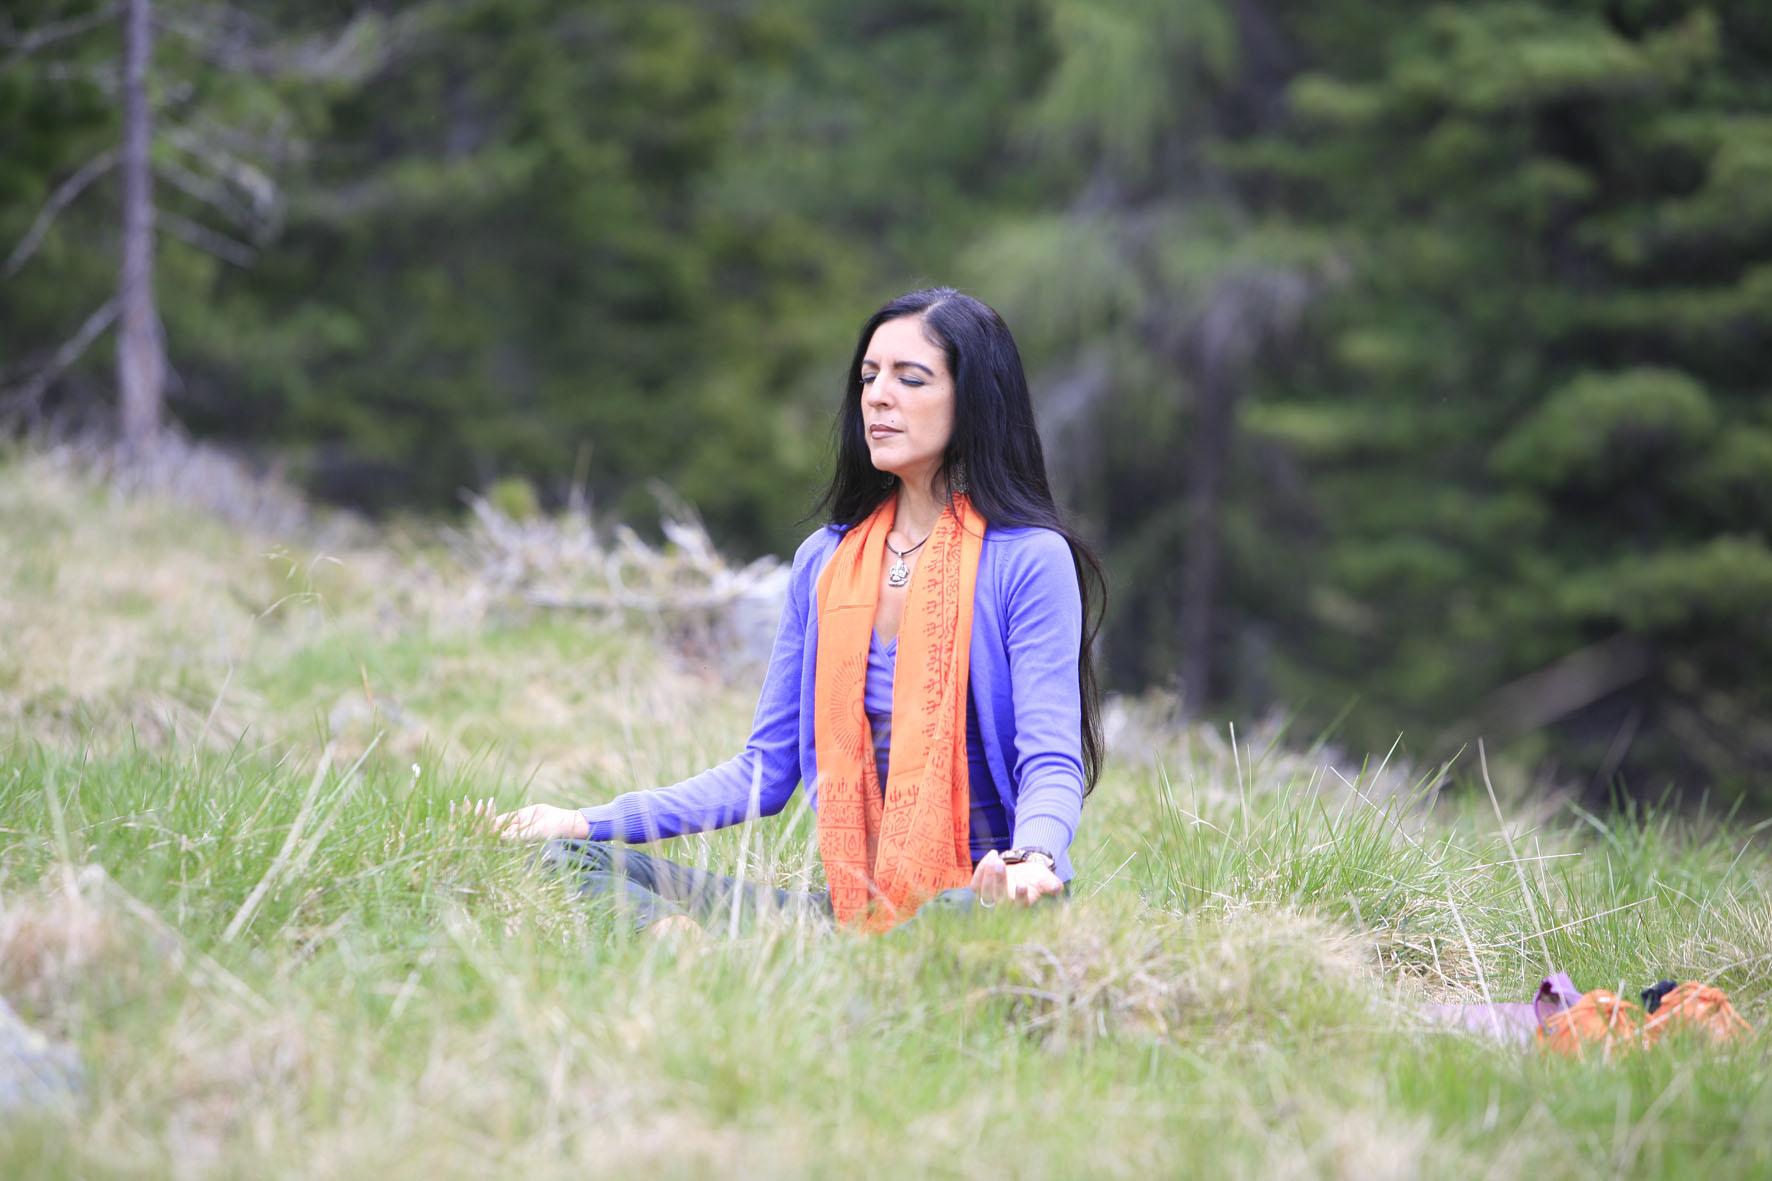 Atmung & Yoga im Park